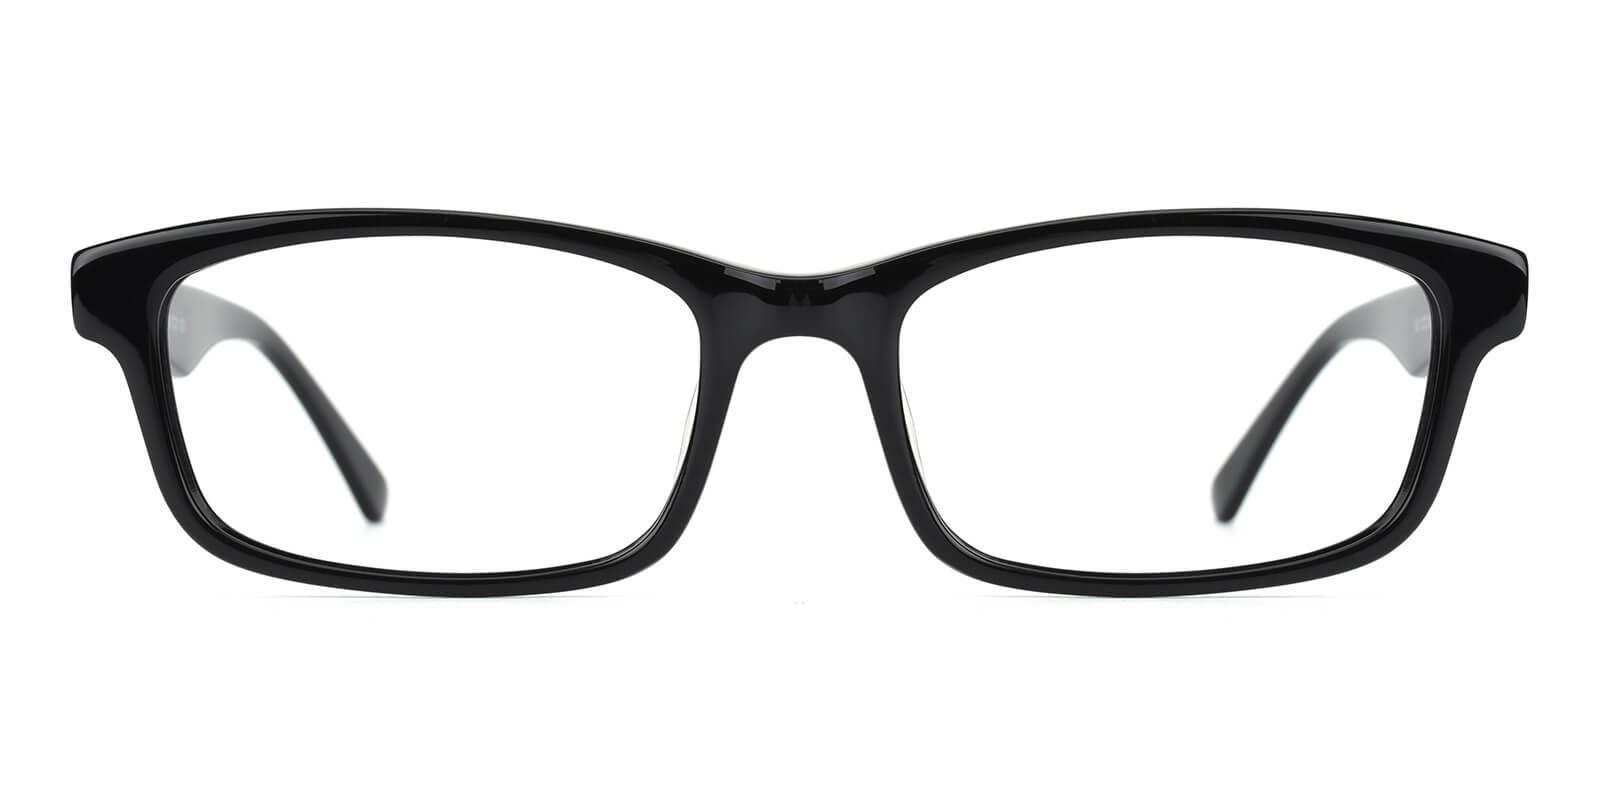 Katric-Black-Rectangle-Acetate-Eyeglasses-additional2